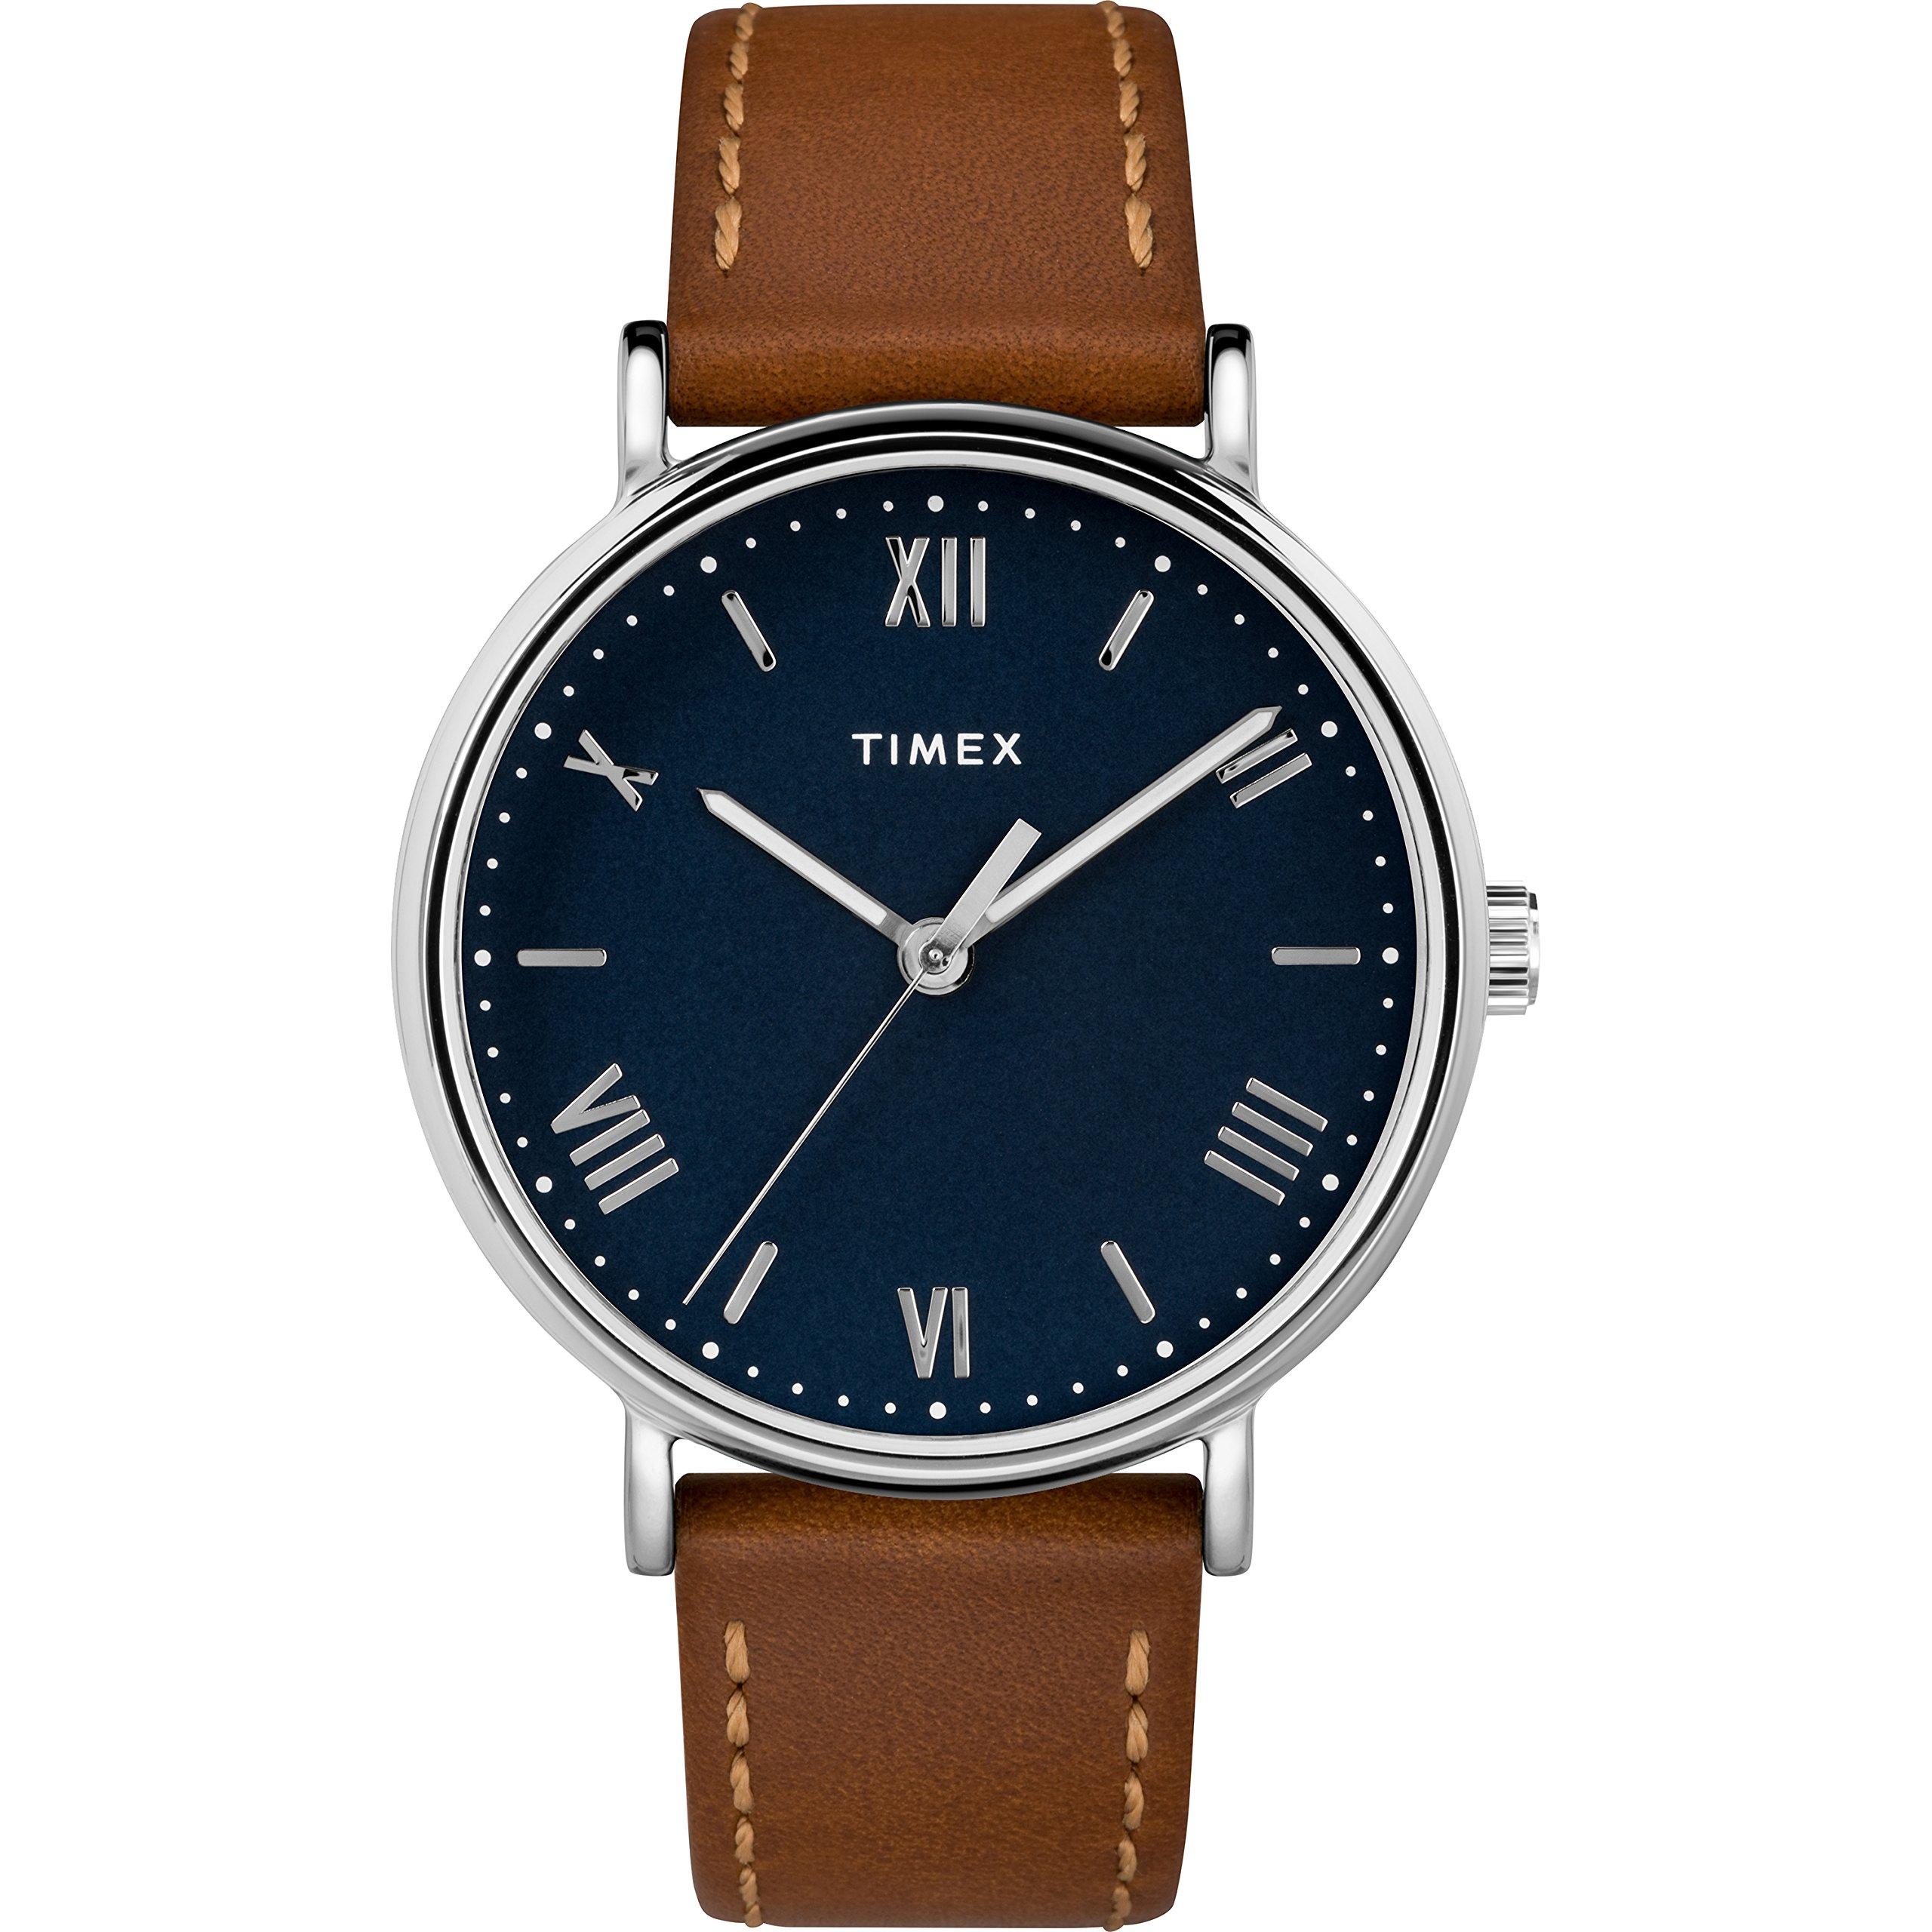 Timex Men's TW2R63900 Southview 41 Tan/Silver Tone/Blue Leather Strap Watch by Timex